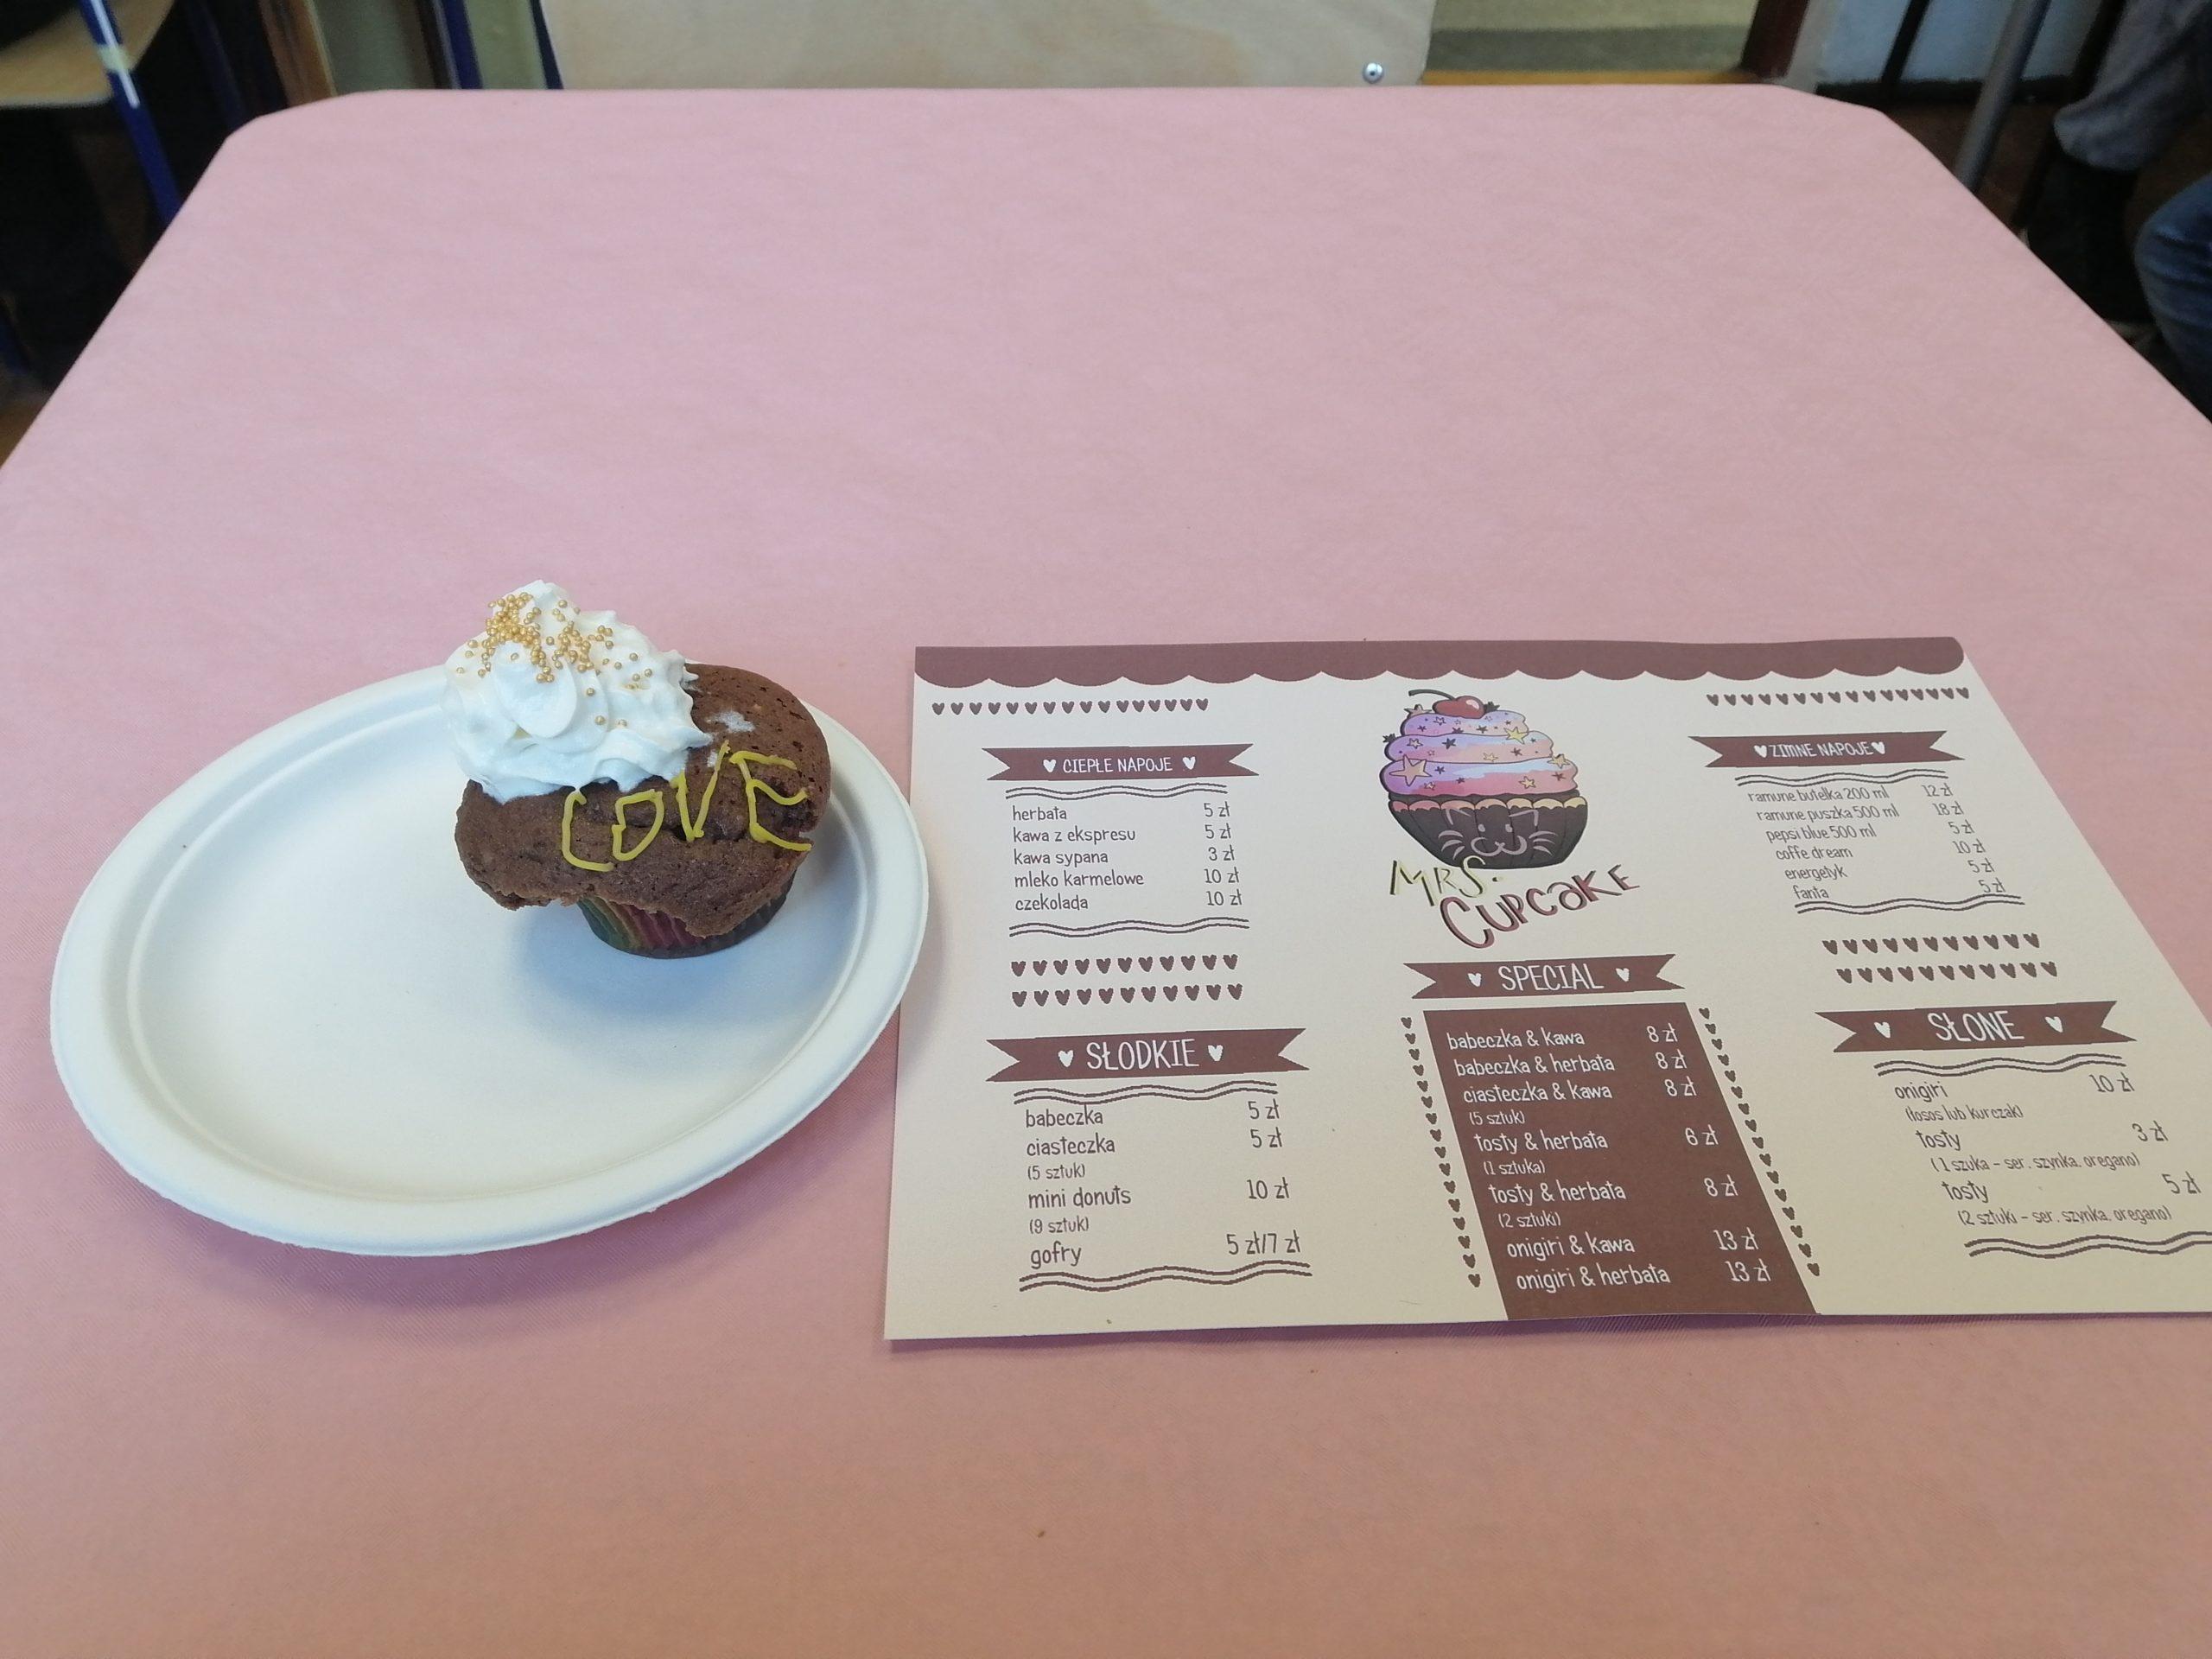 Kawiarenka meido - Mrs. Cupcake